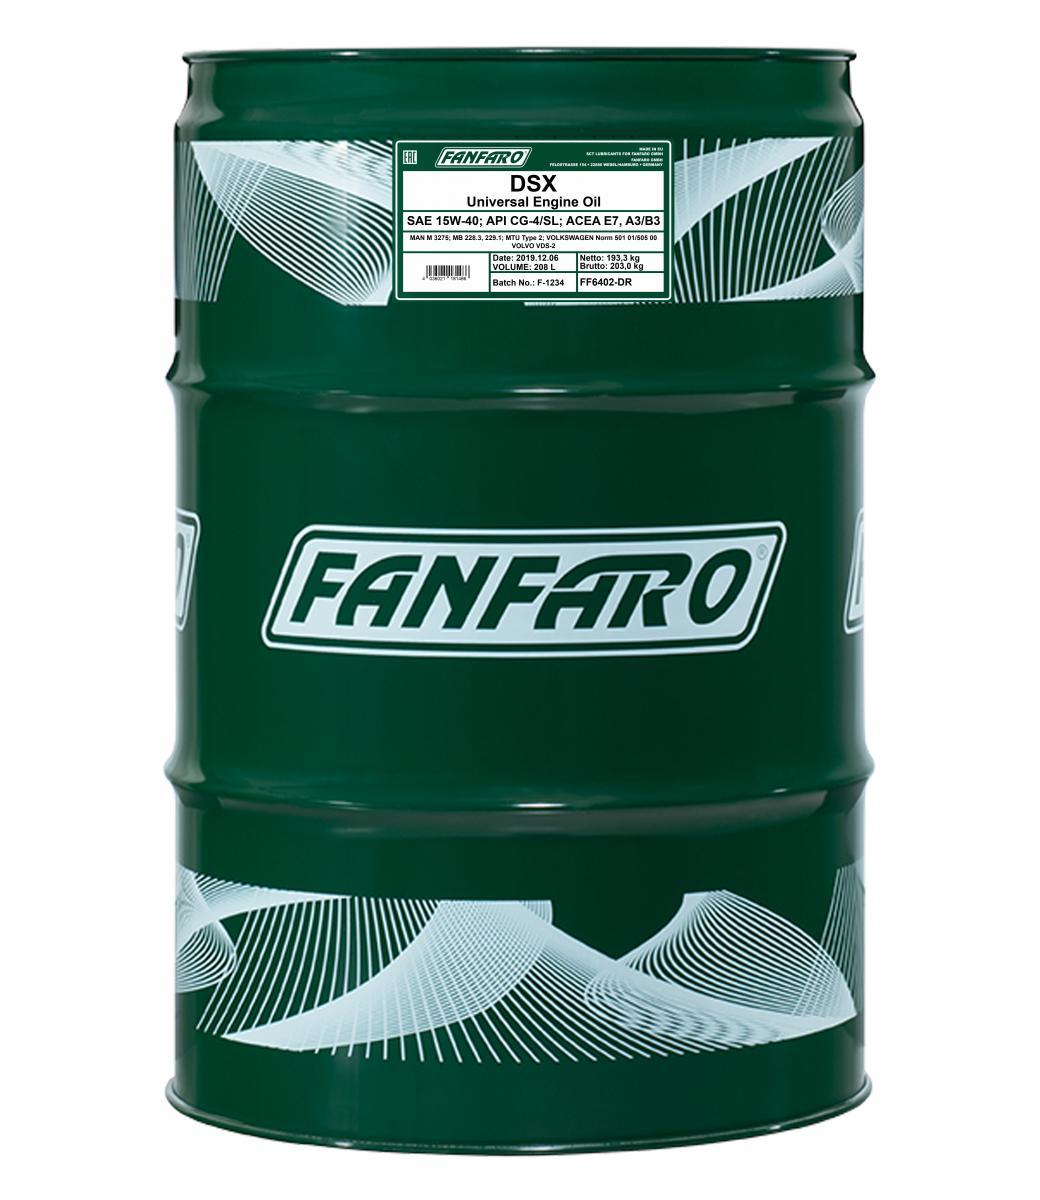 FF6402-DR FANFARO Master Line, DSX 15W-40, 208l, Mineralöl Motoröl FF6402-DR günstig kaufen